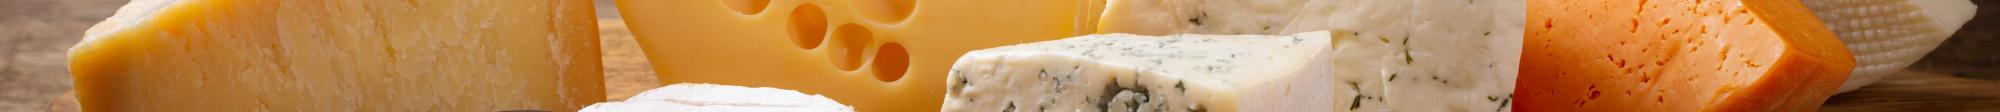 Comprar queso online curación gourmet | Mixtura Gourmet